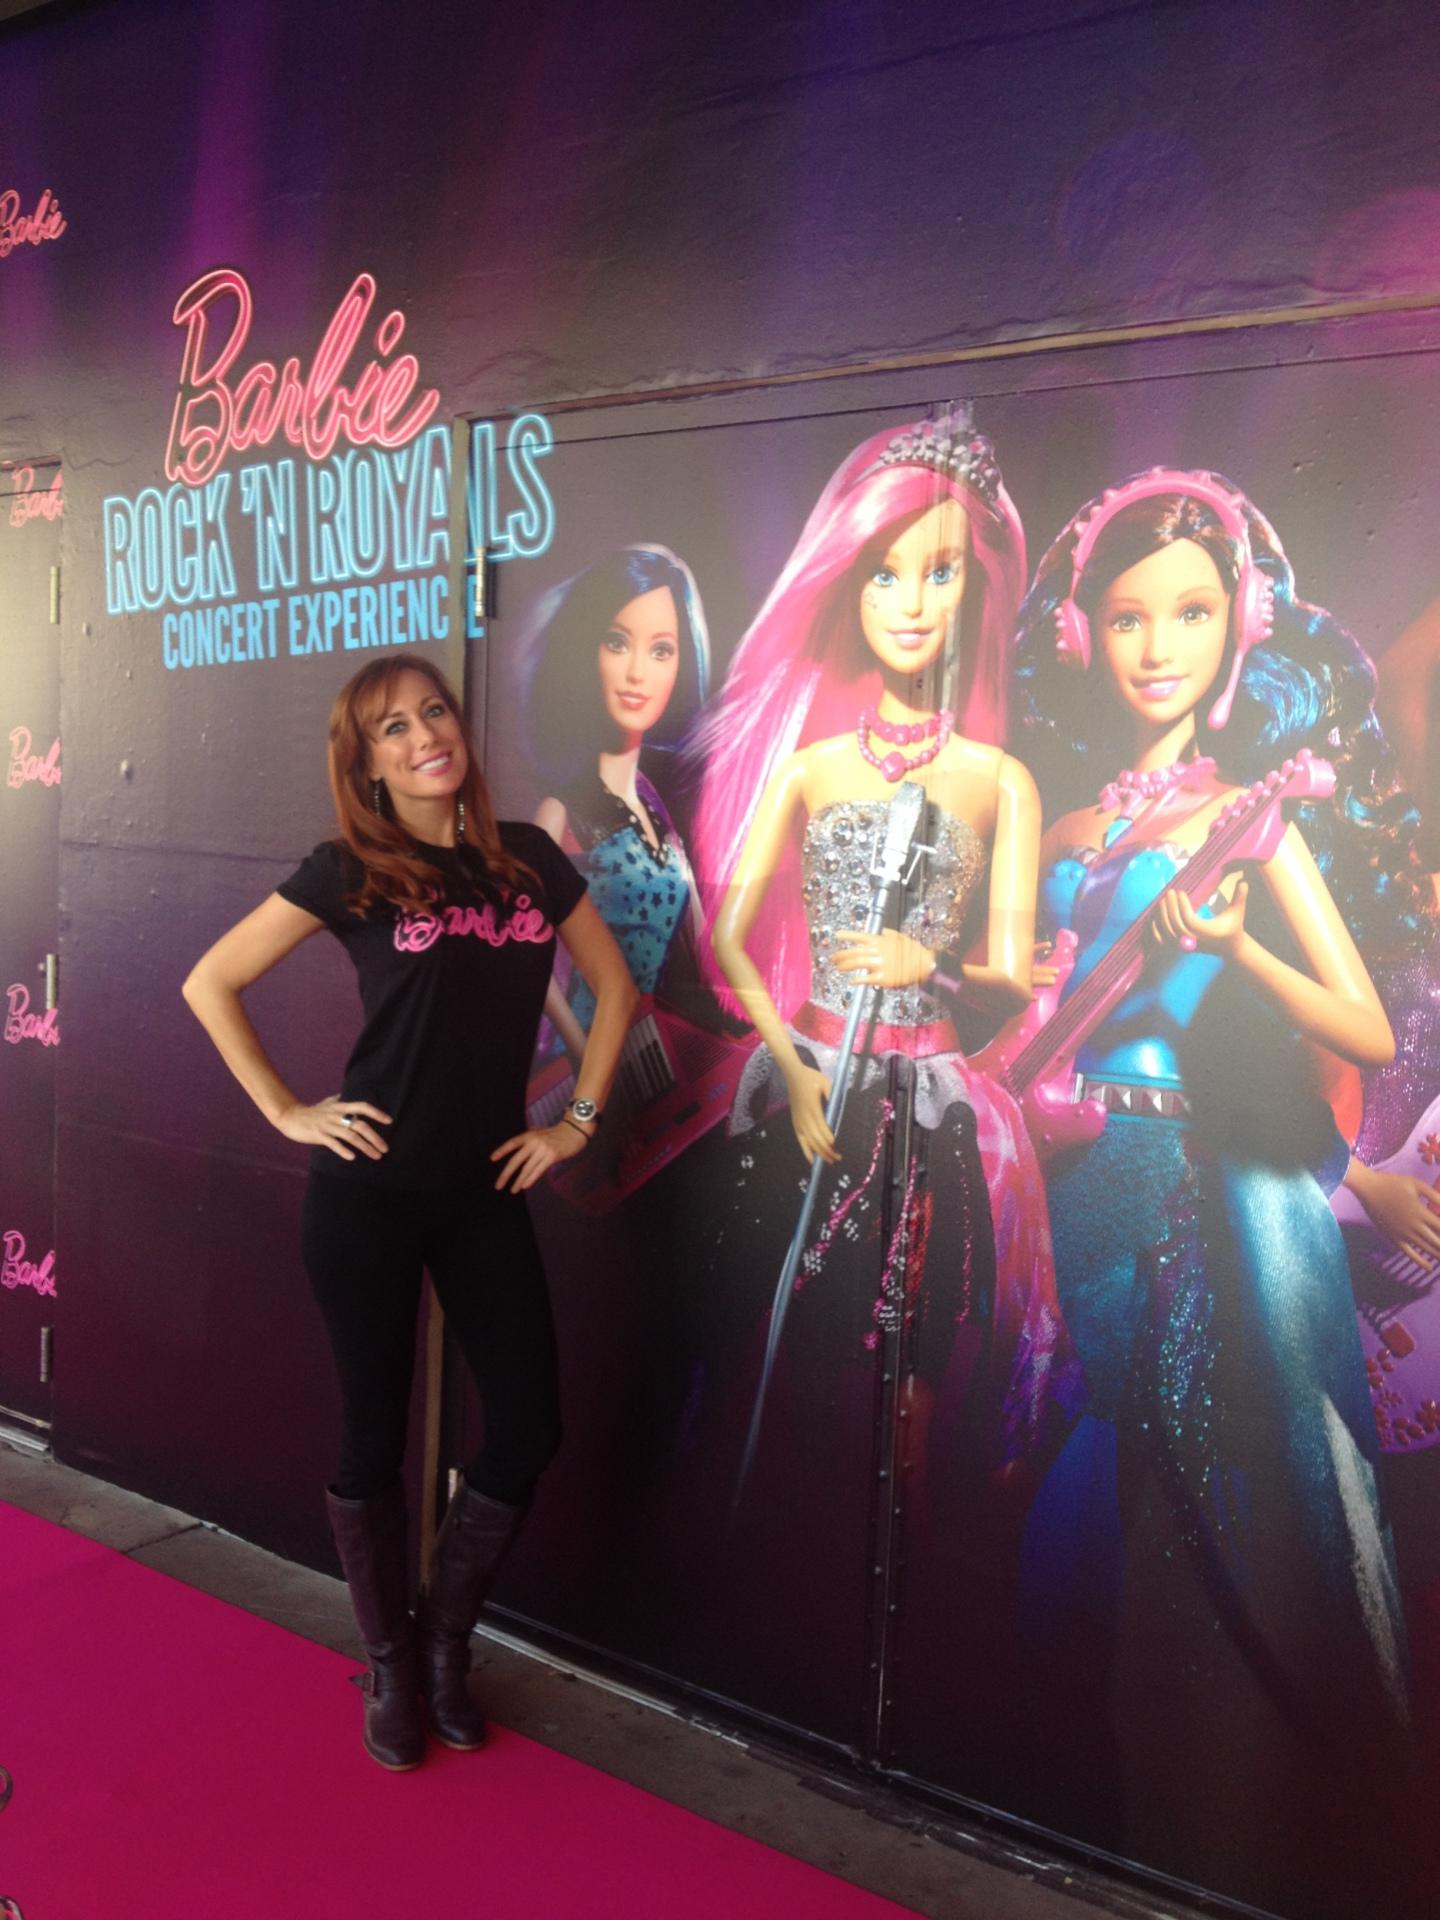 Promo Model - Rock & Royals Concert - Barbie